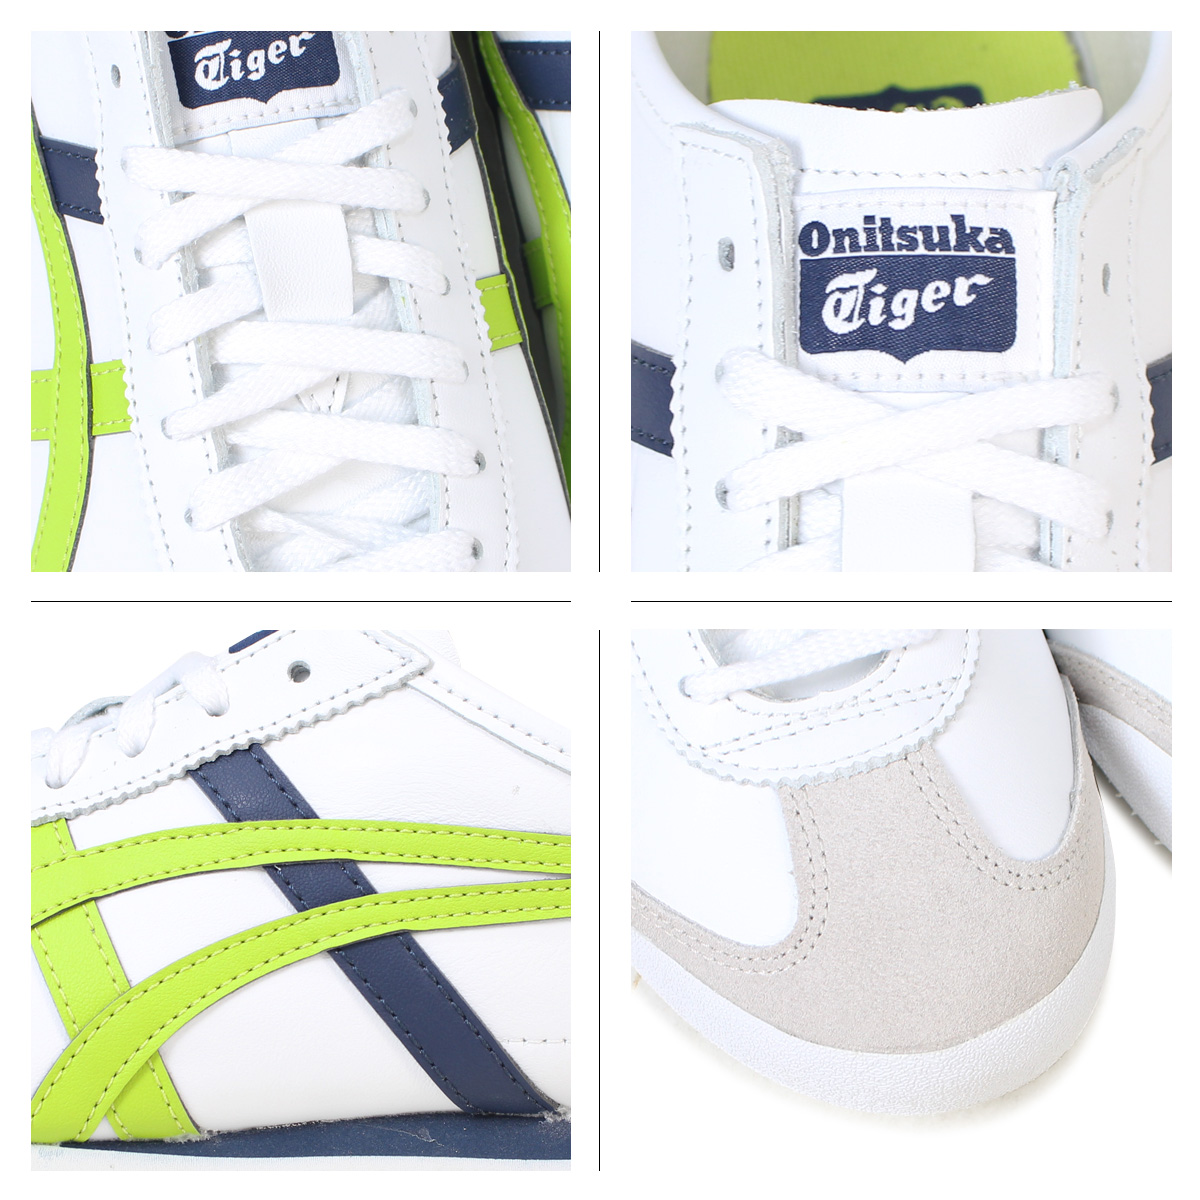 purchase cheap bb3a3 a94fd Onitsuka tiger Onitsuka Tiger Mexico 66 MEXICO 66 men's sneakers ASICS  HL474-0187 white